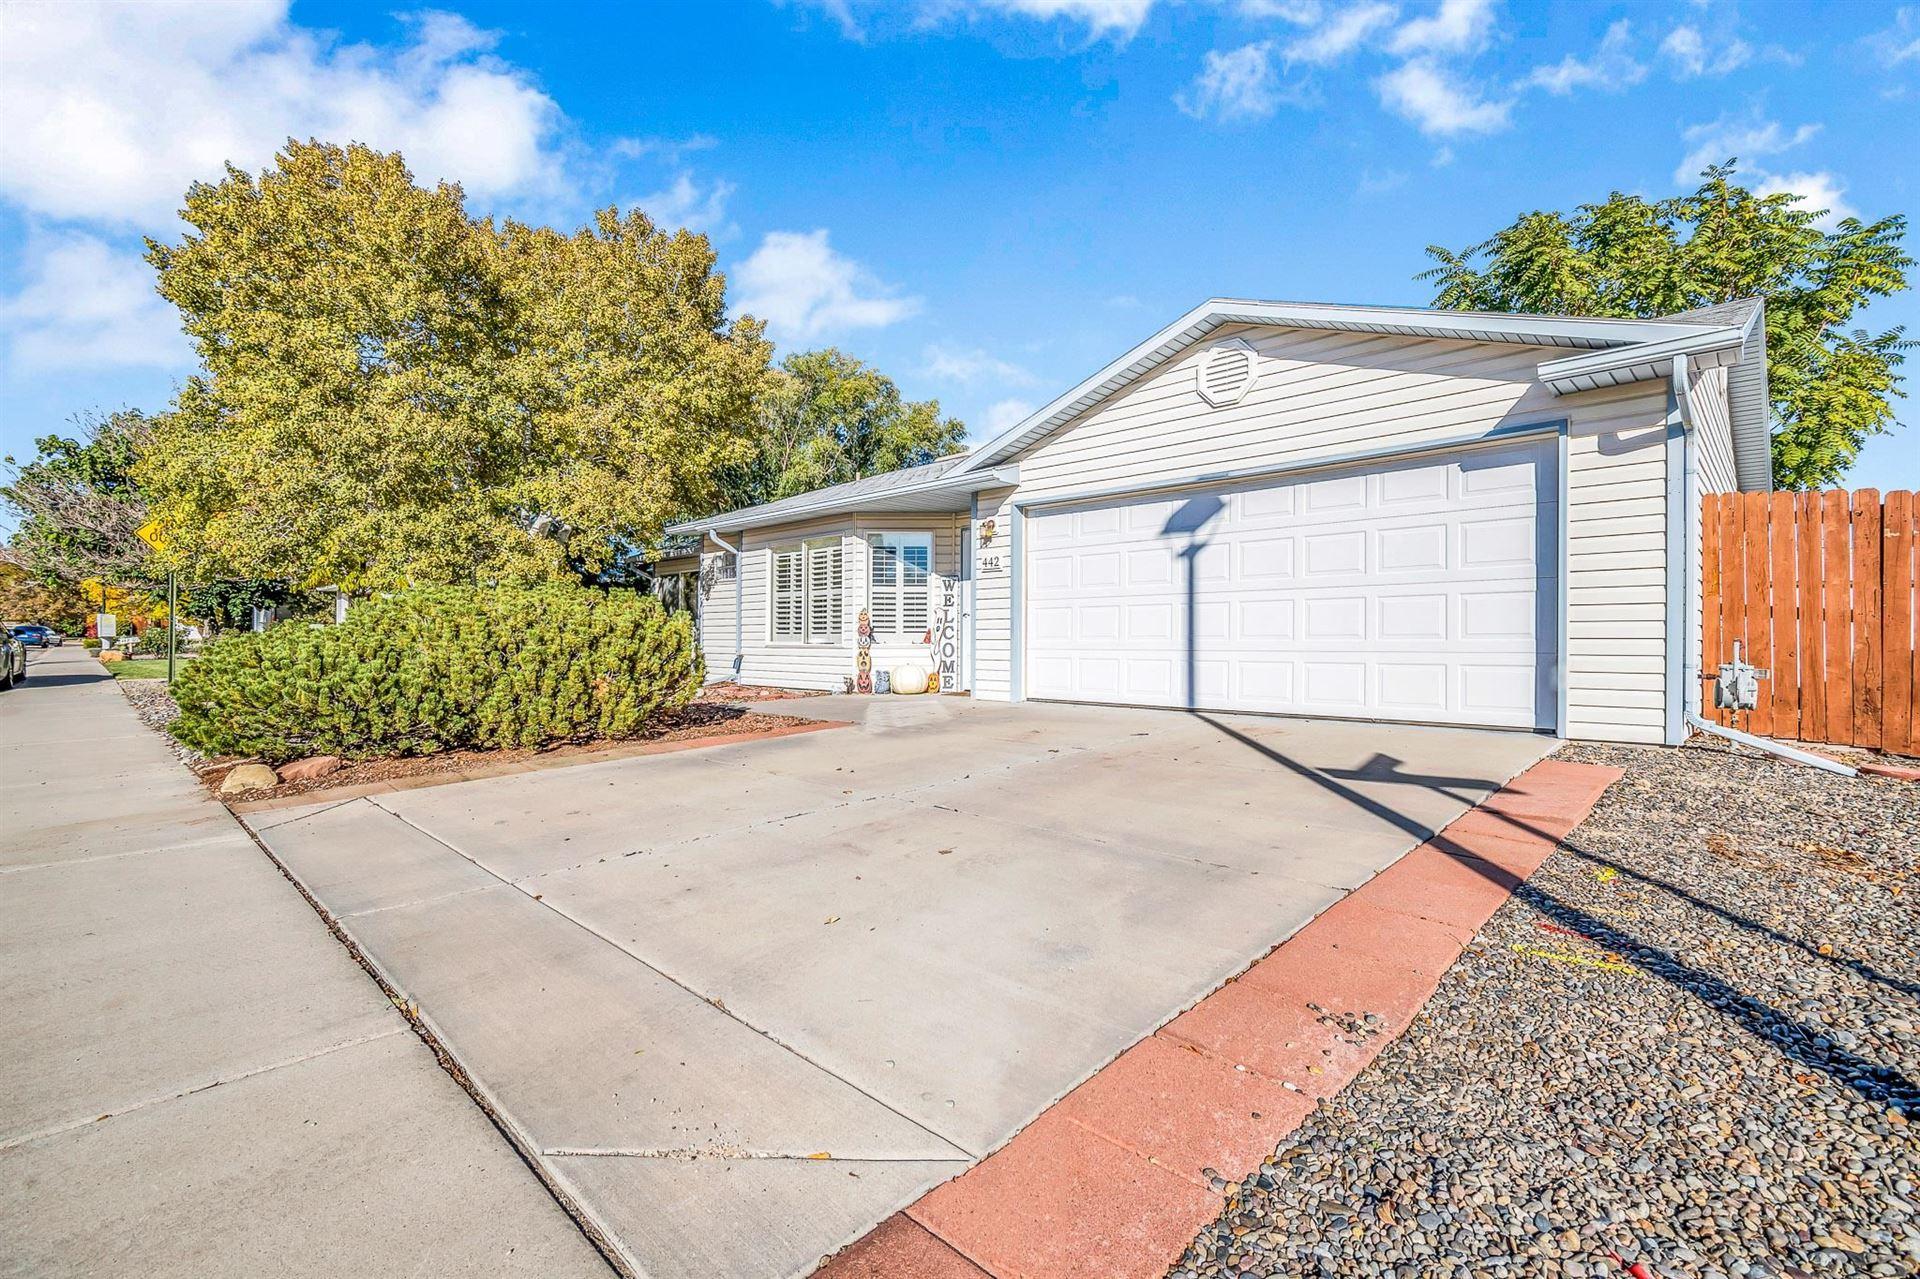 Photo of 442 Mountainside Lane, Grand Junction, CO 81504 (MLS # 20215702)